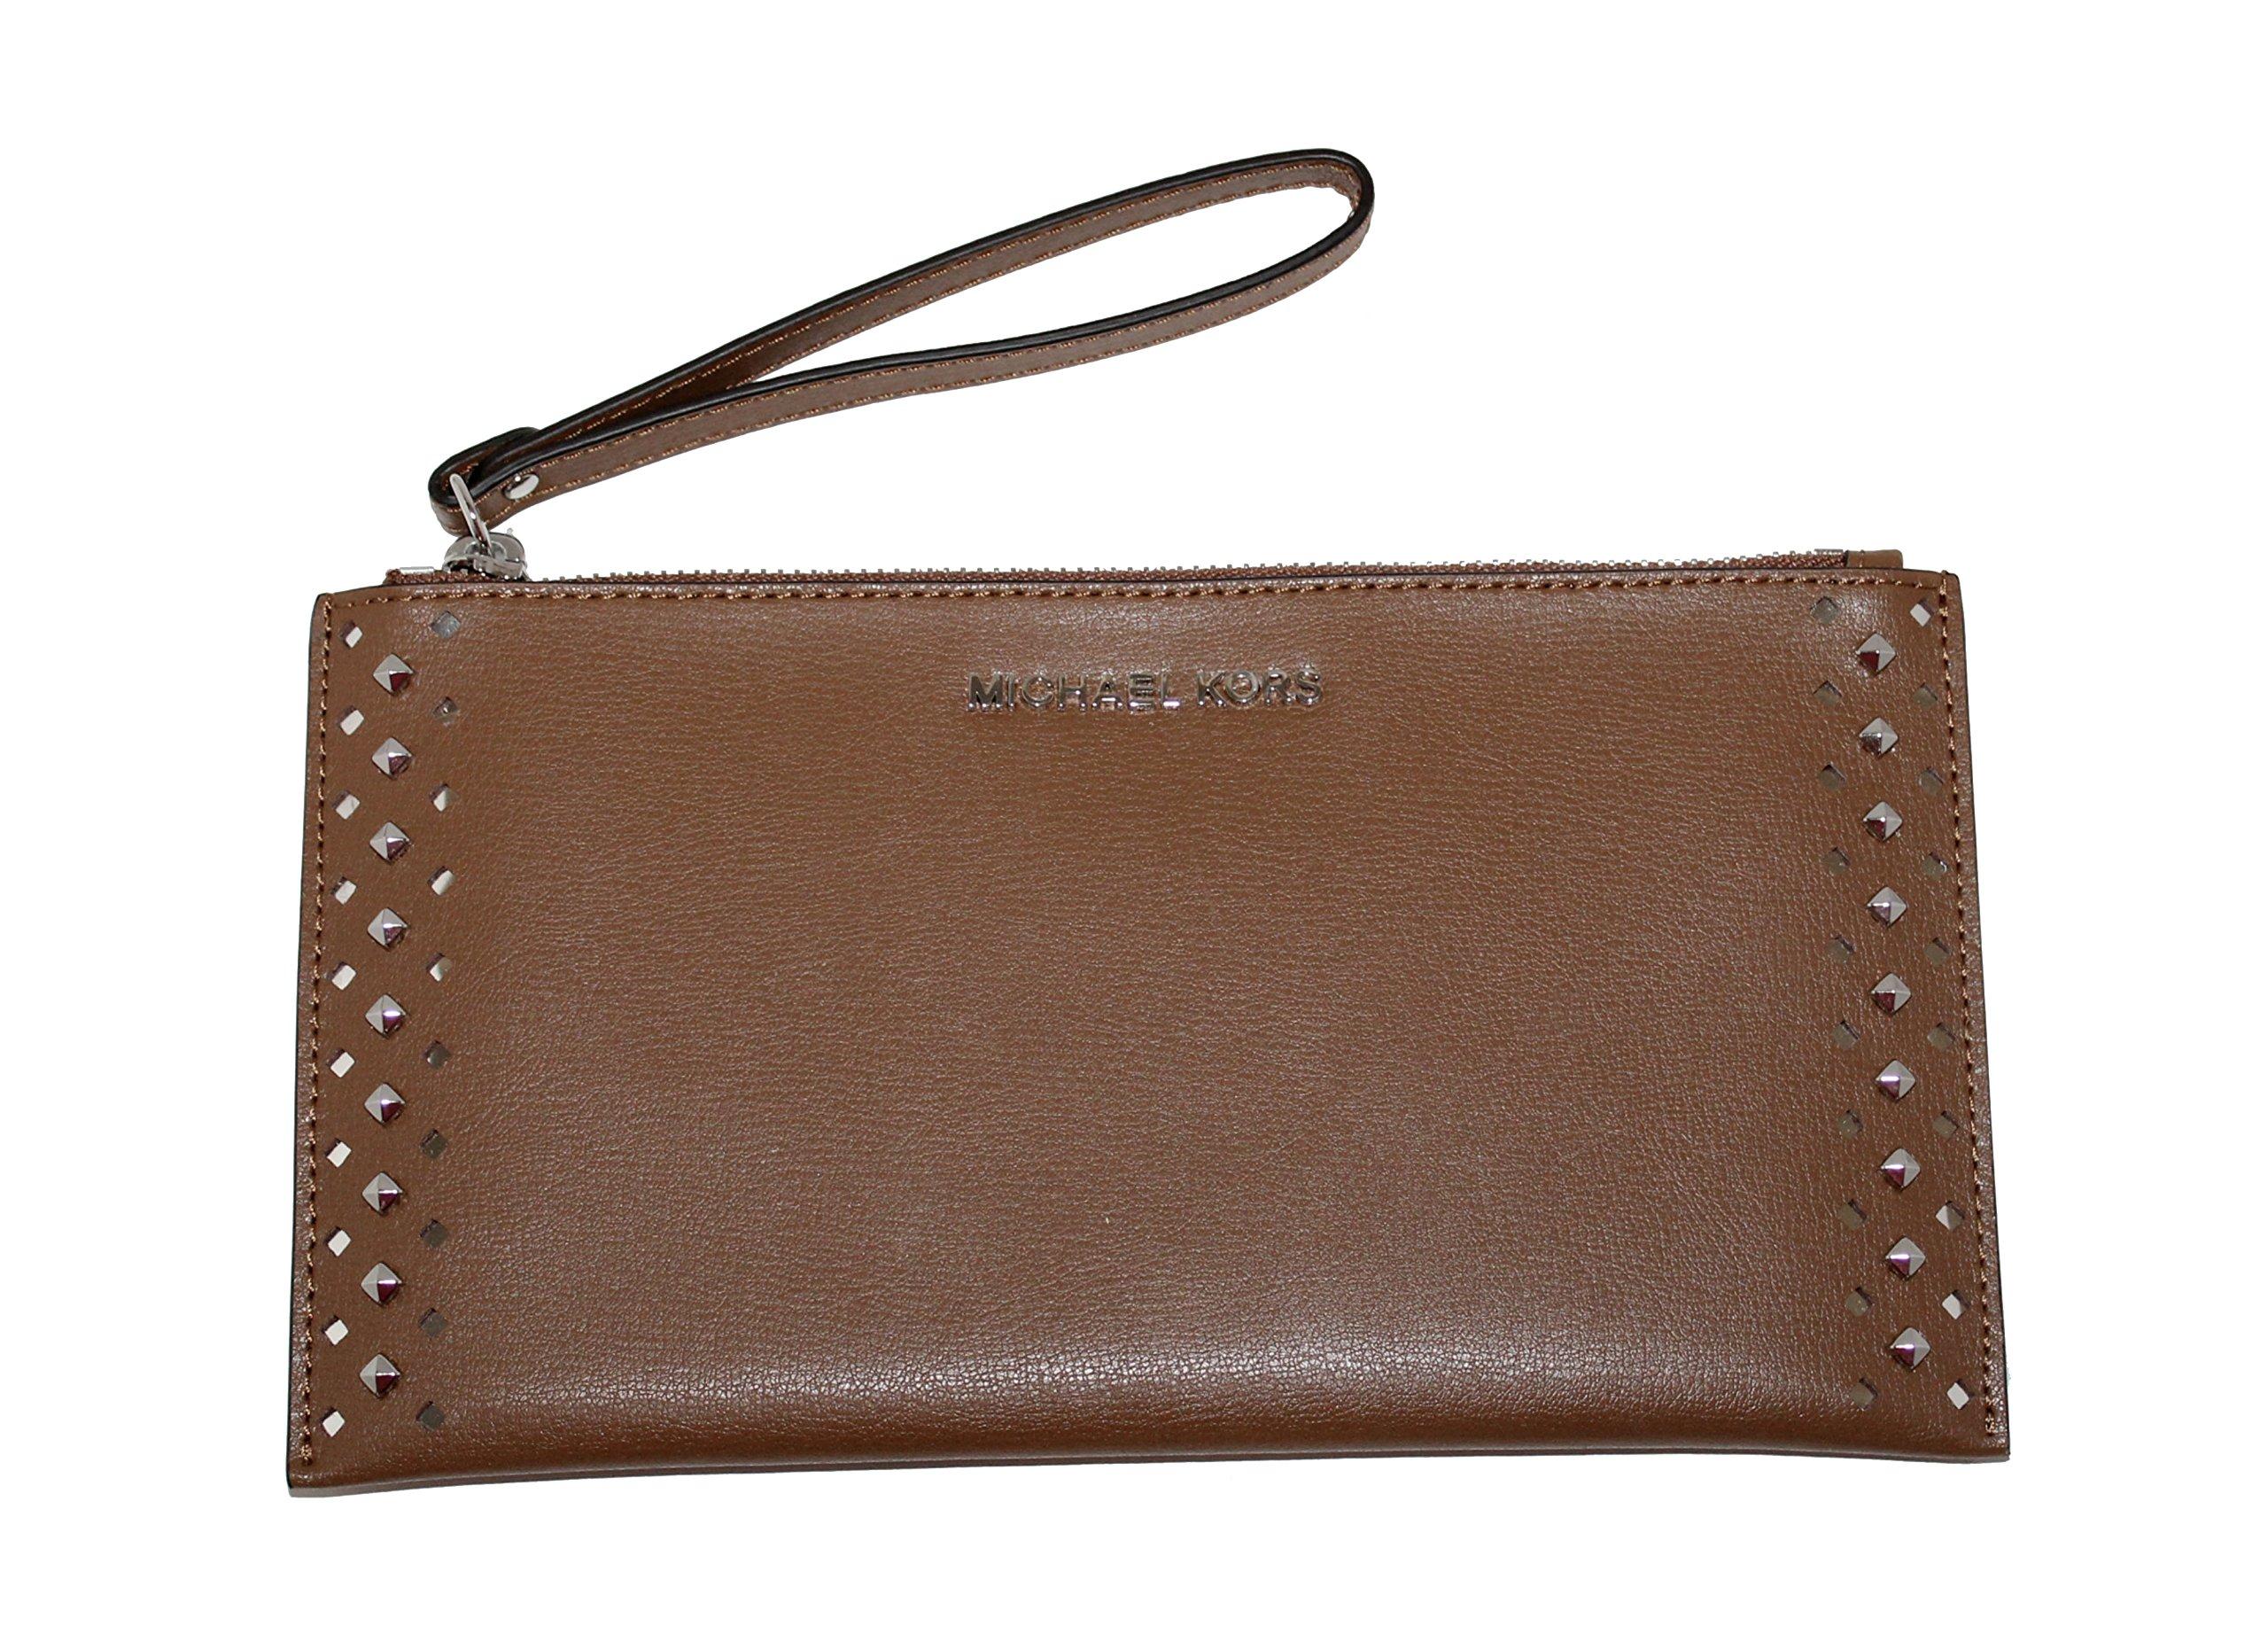 MICHAEL Michael Kors Women's Jet Set Travel Leather Zip Clutch (Luggage) by MICHAEL Michael Kors